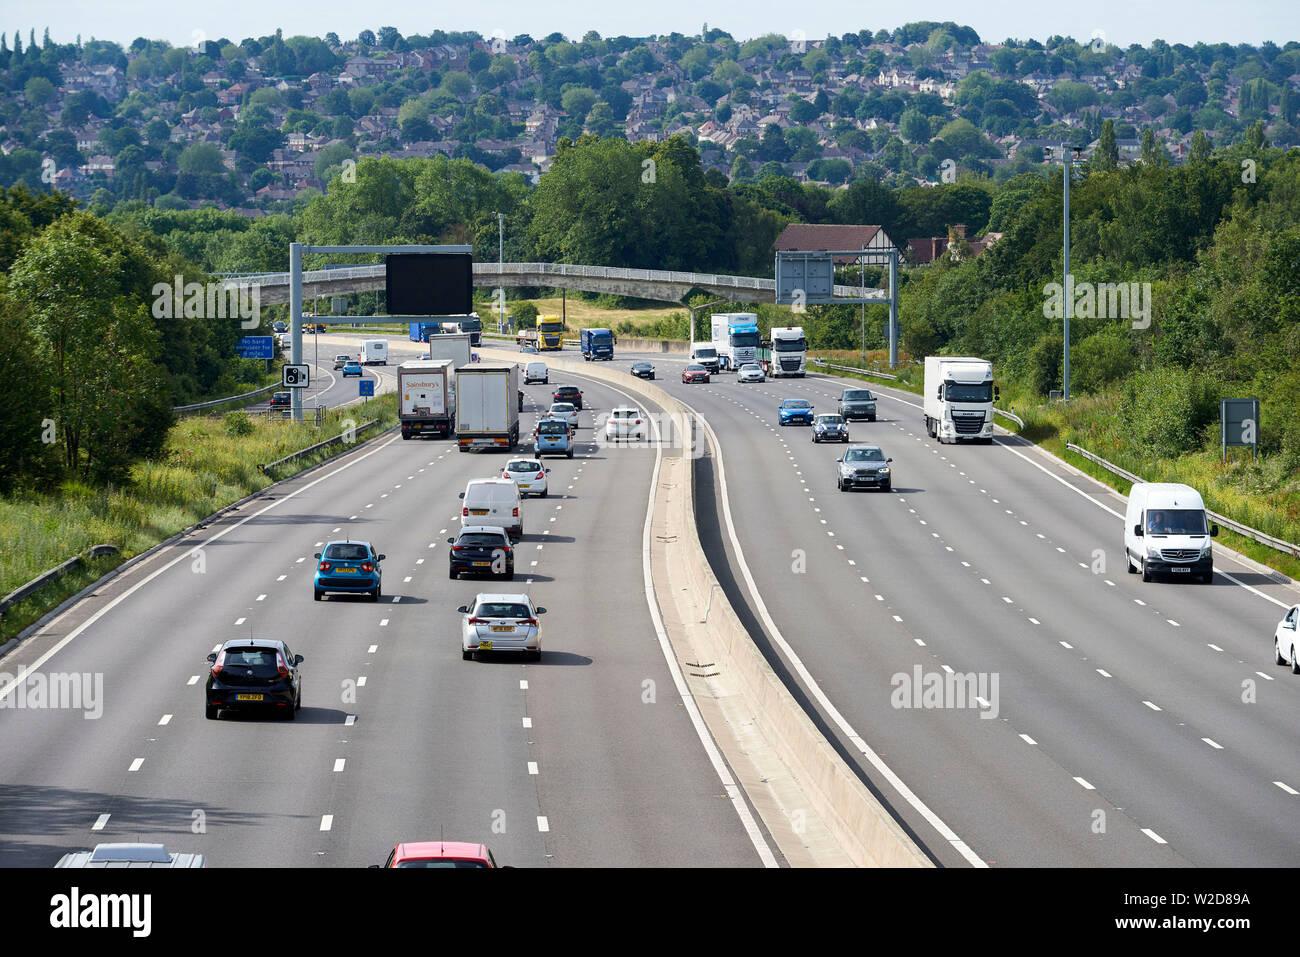 M1 Motorway between Rotherham & Sheffield, South Yorkshire, Northern England, UK - Stock Image